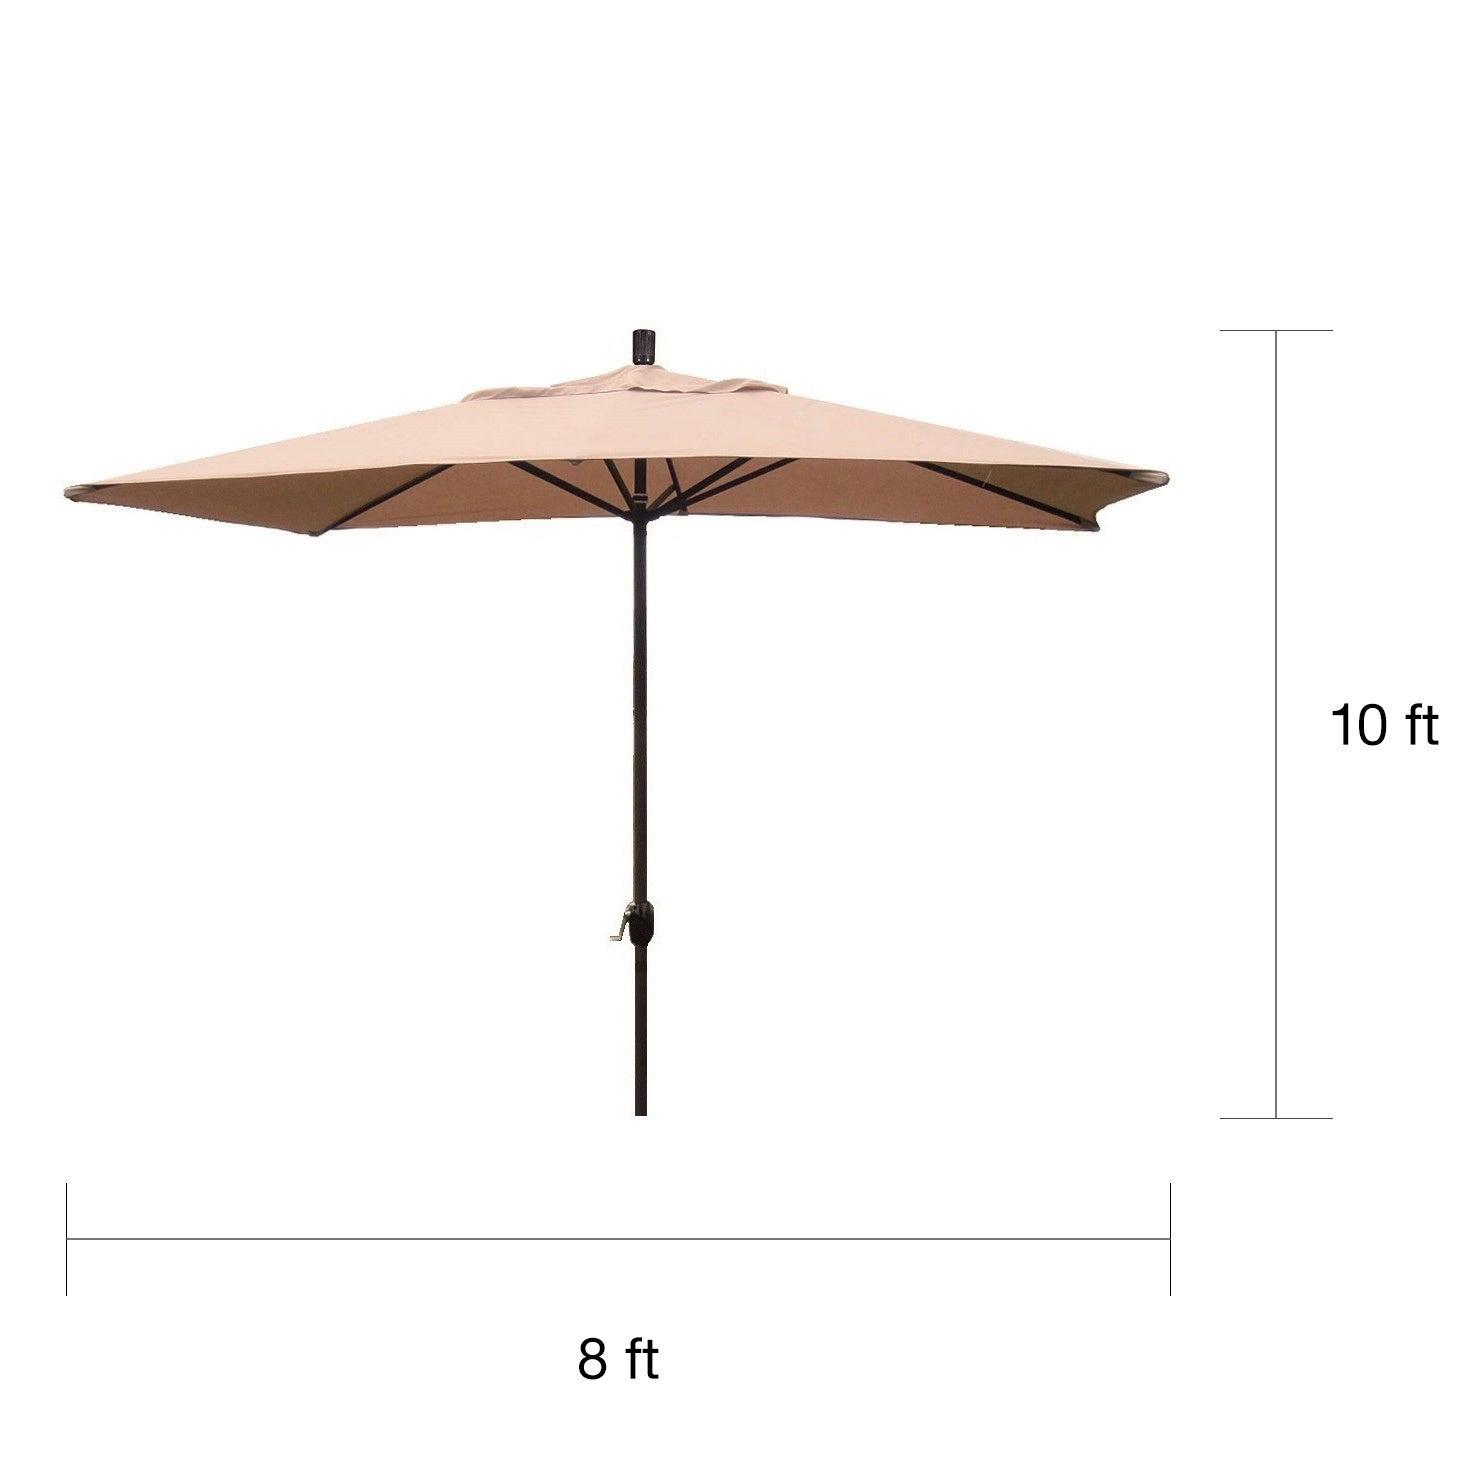 coral coast x hayneedle patio cfm master umbrella rectangular rectangle ft poly product spun aluminum umbrellas